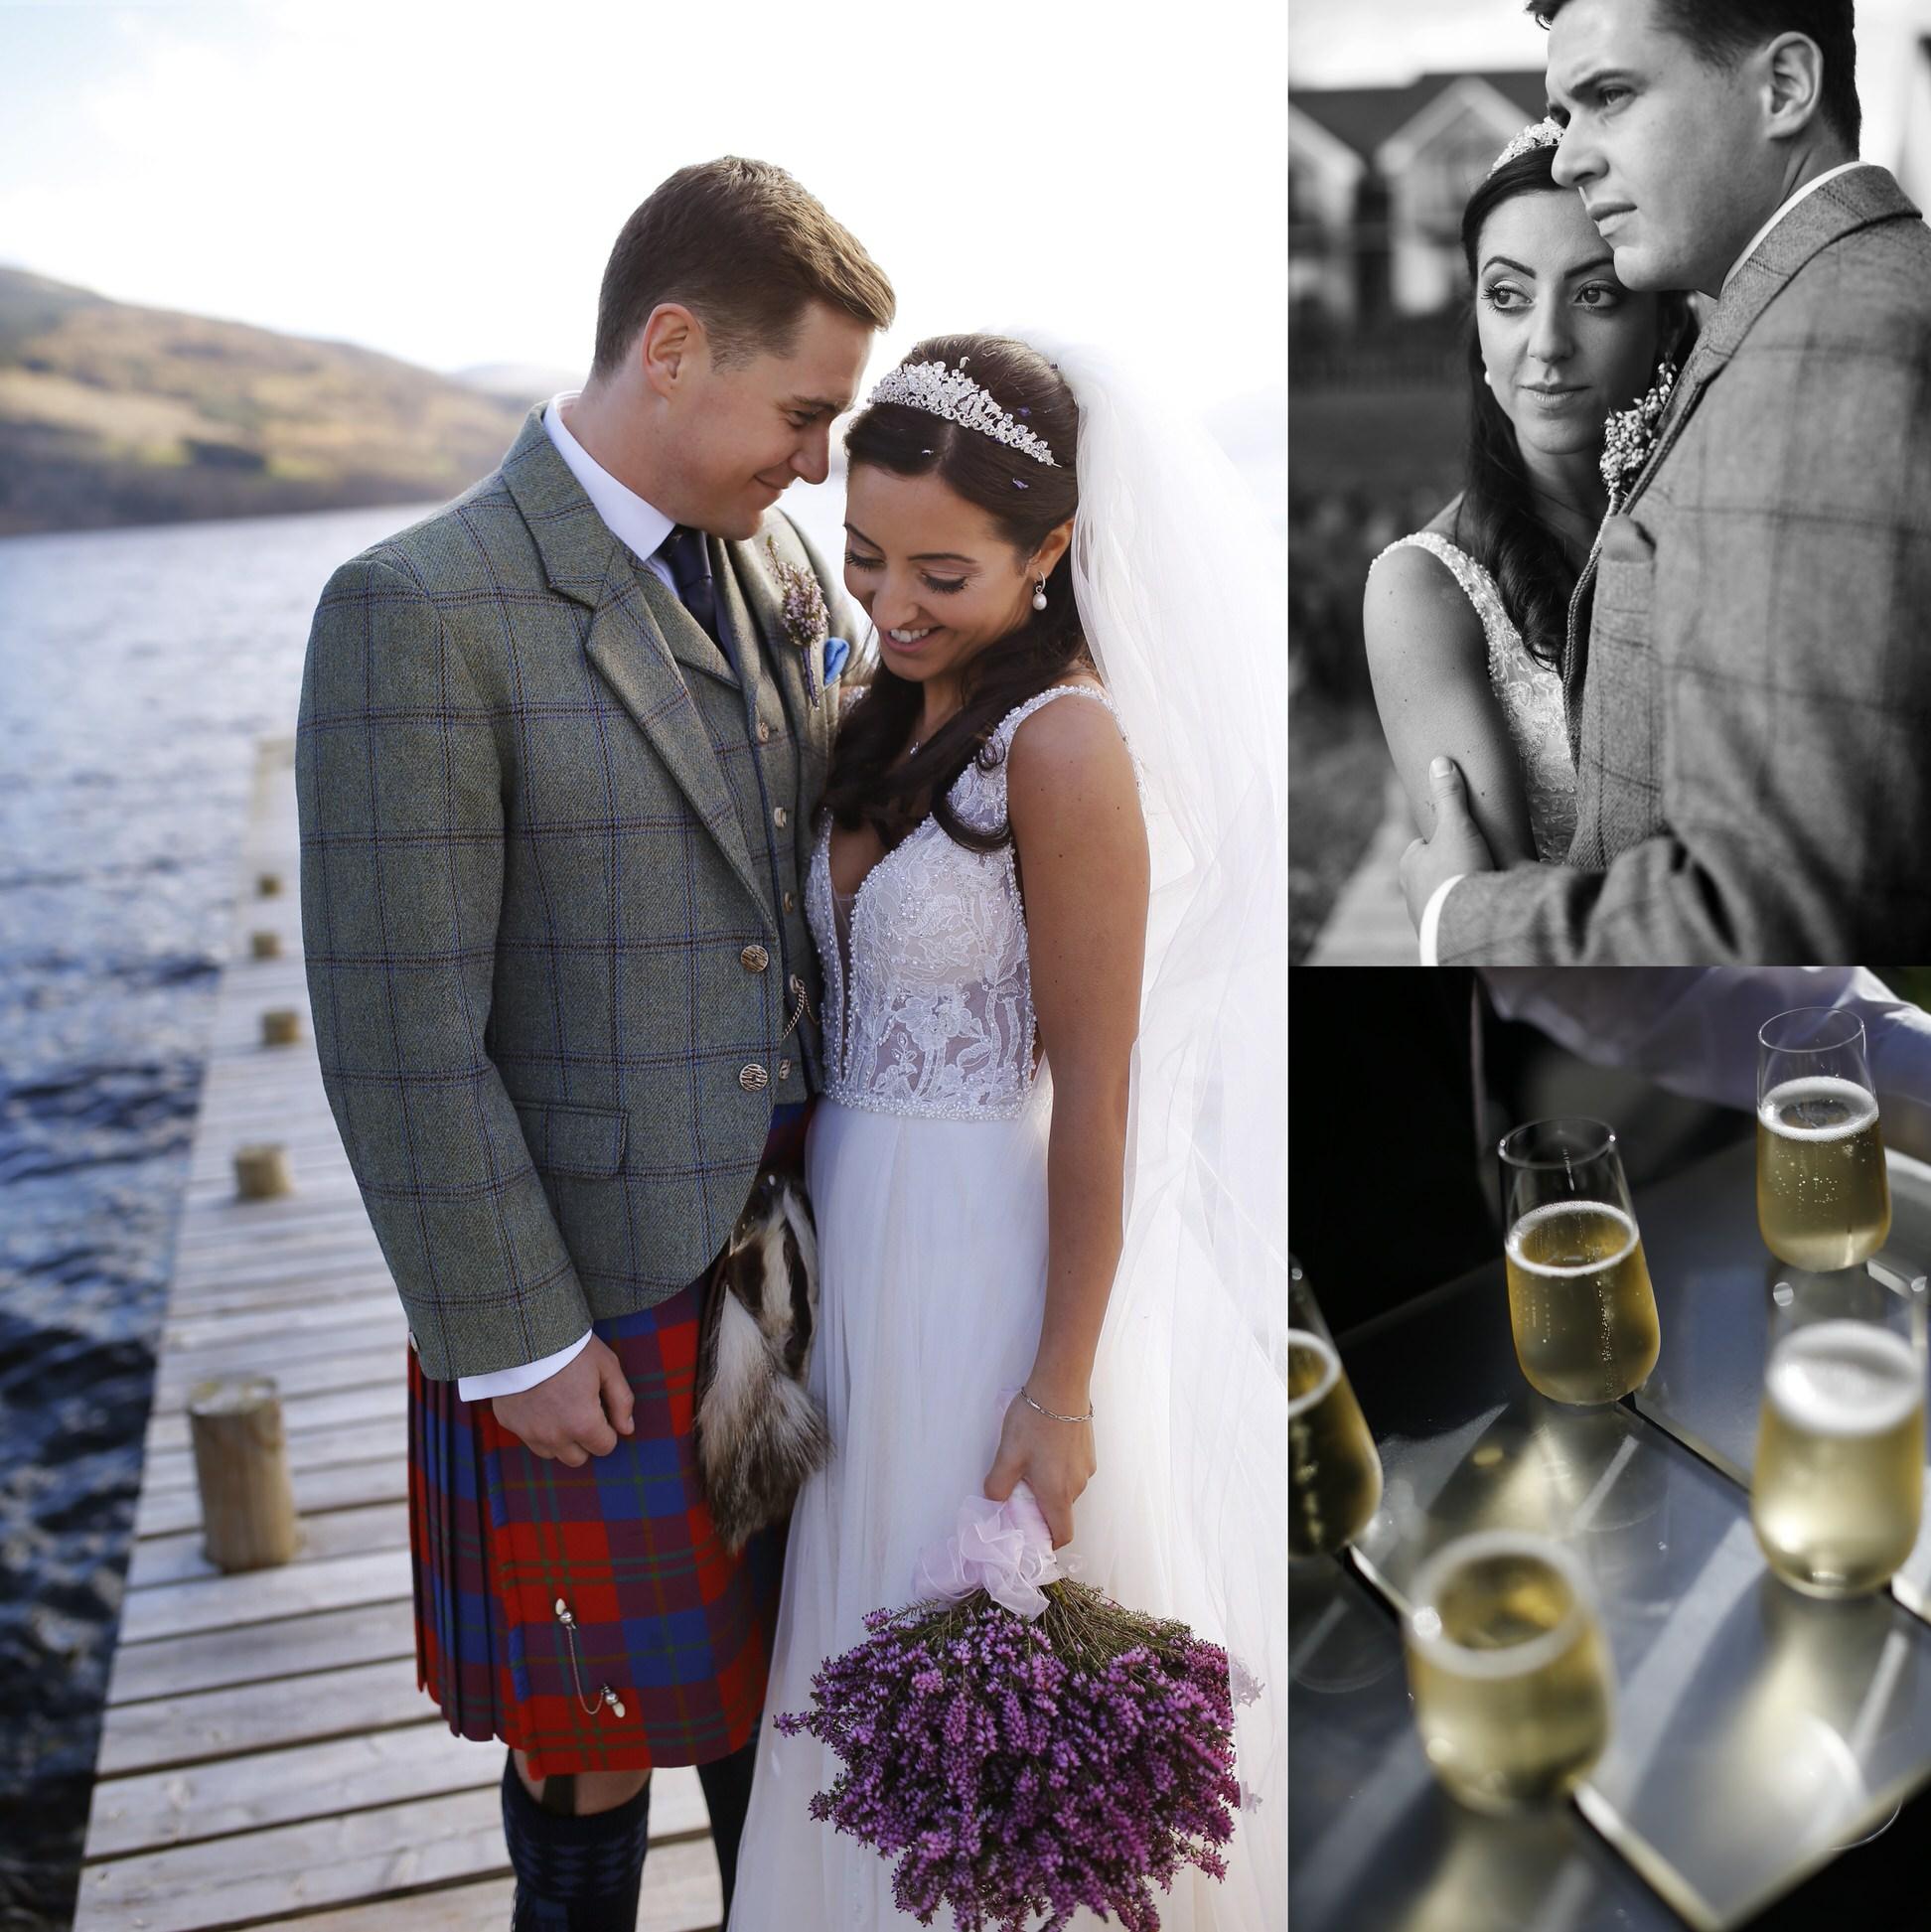 brett-harkness-cotland-wedding-photographer-highland-wedding_0025.jpg